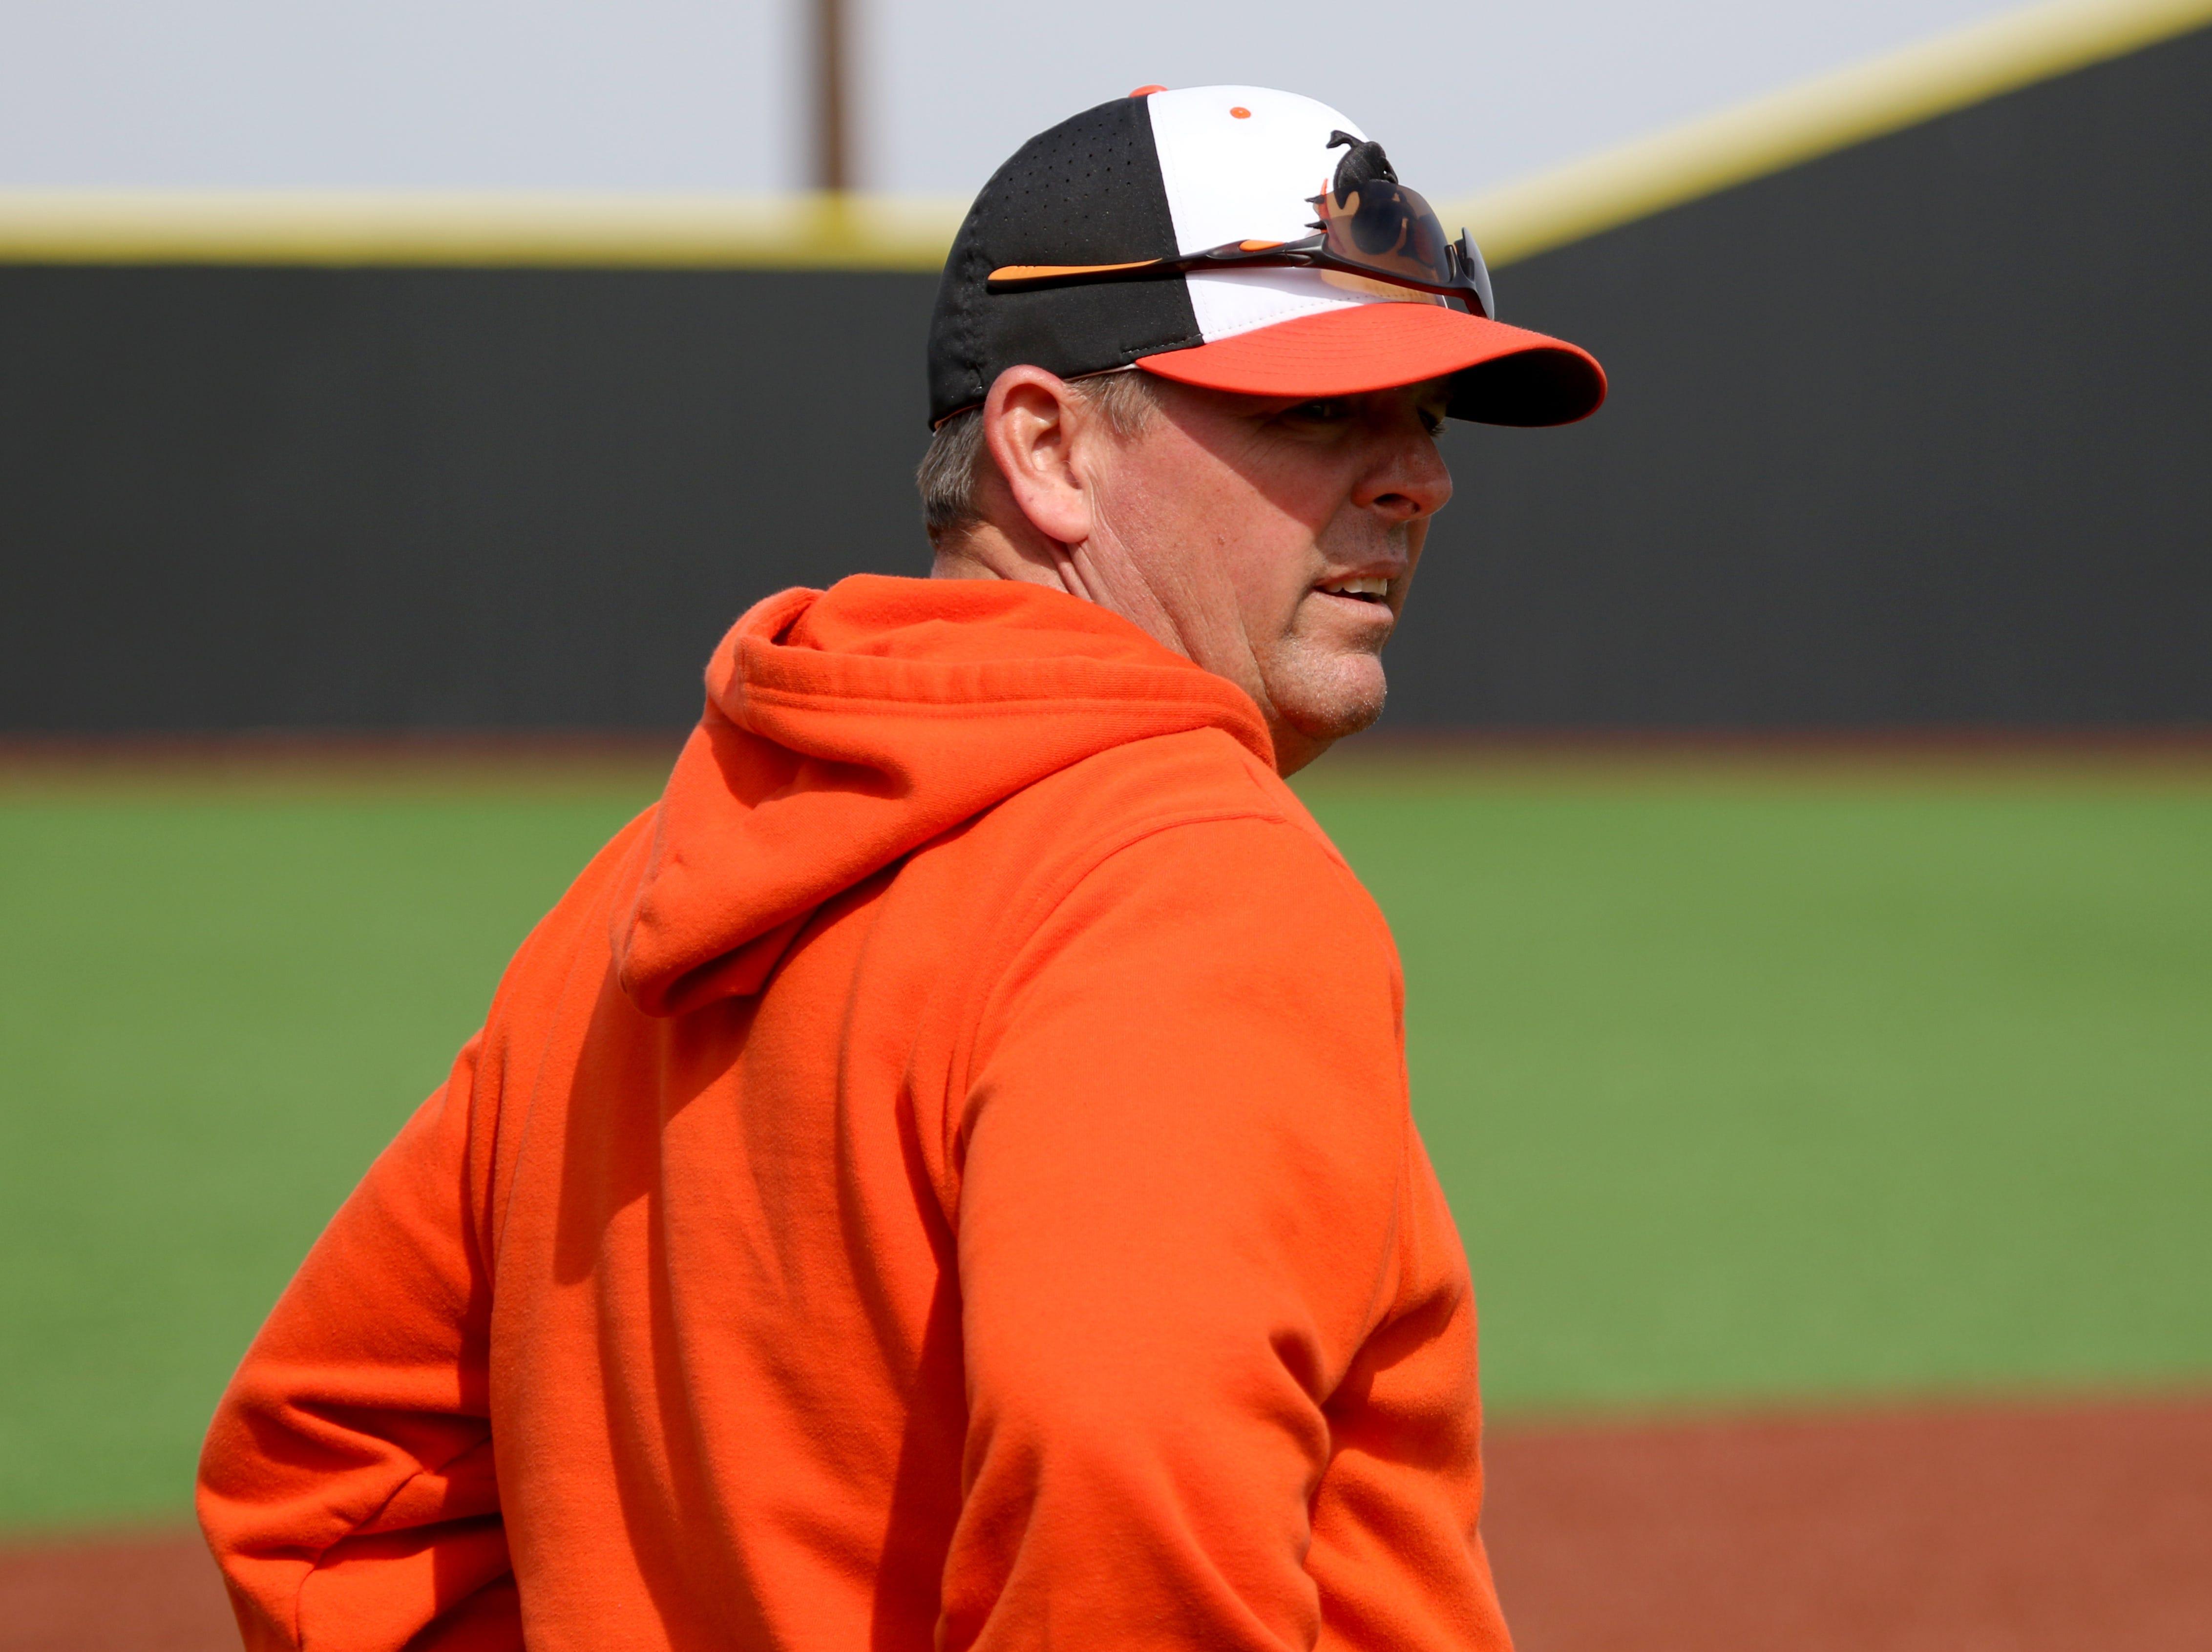 Burkburnett head baseball coach Scot Green watches from the third base box in the game against Henrietta Friday, March 8 , 2019, in Henrietta.